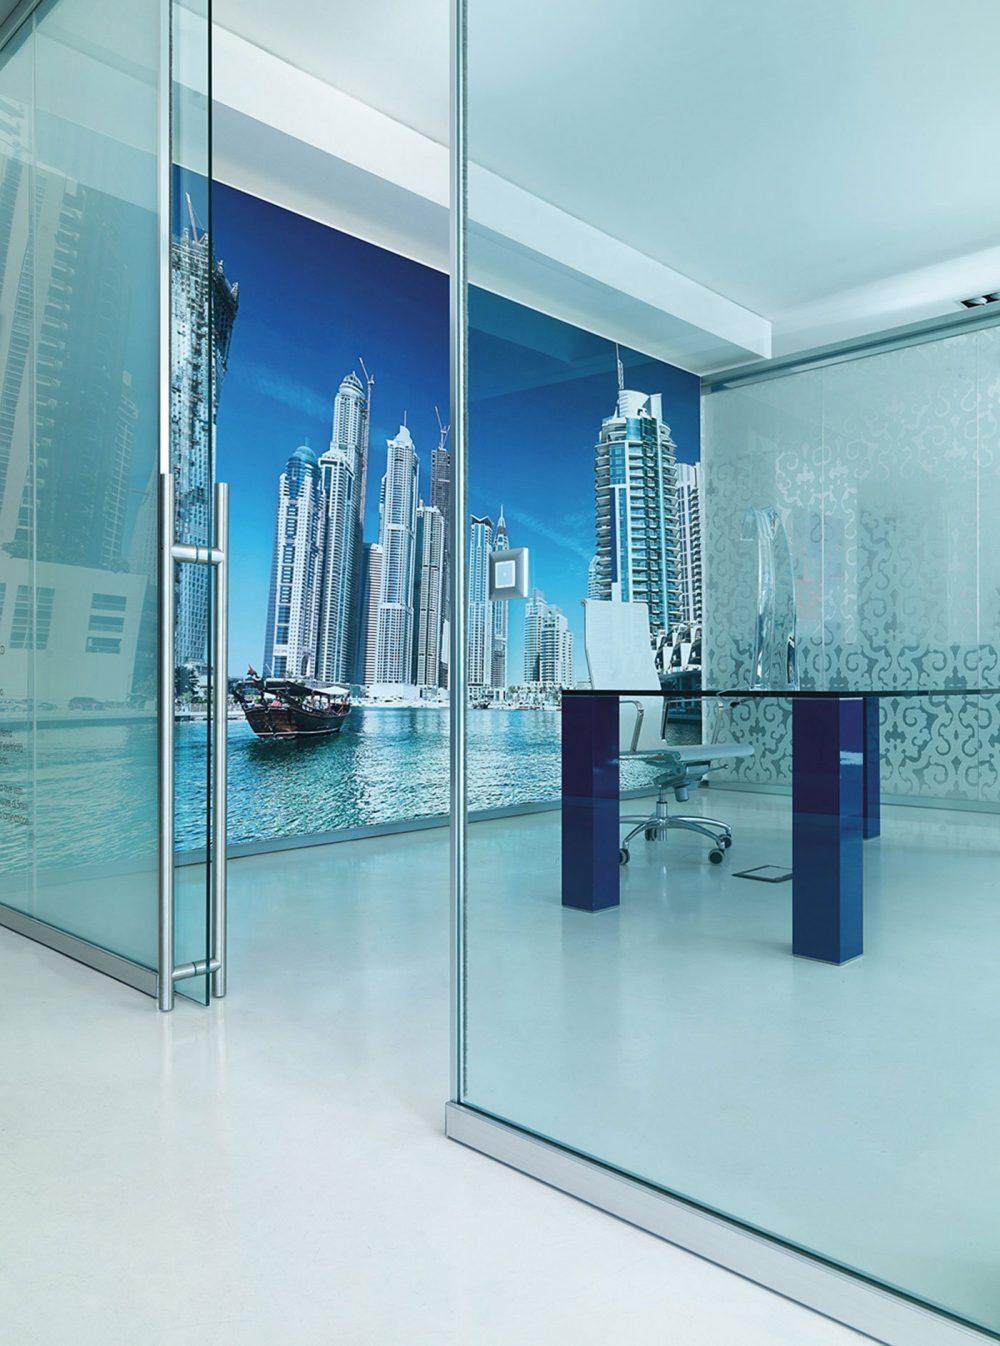 Pareti divisorie per ufficio lightwall arredamento per for Arredamento per ufficio